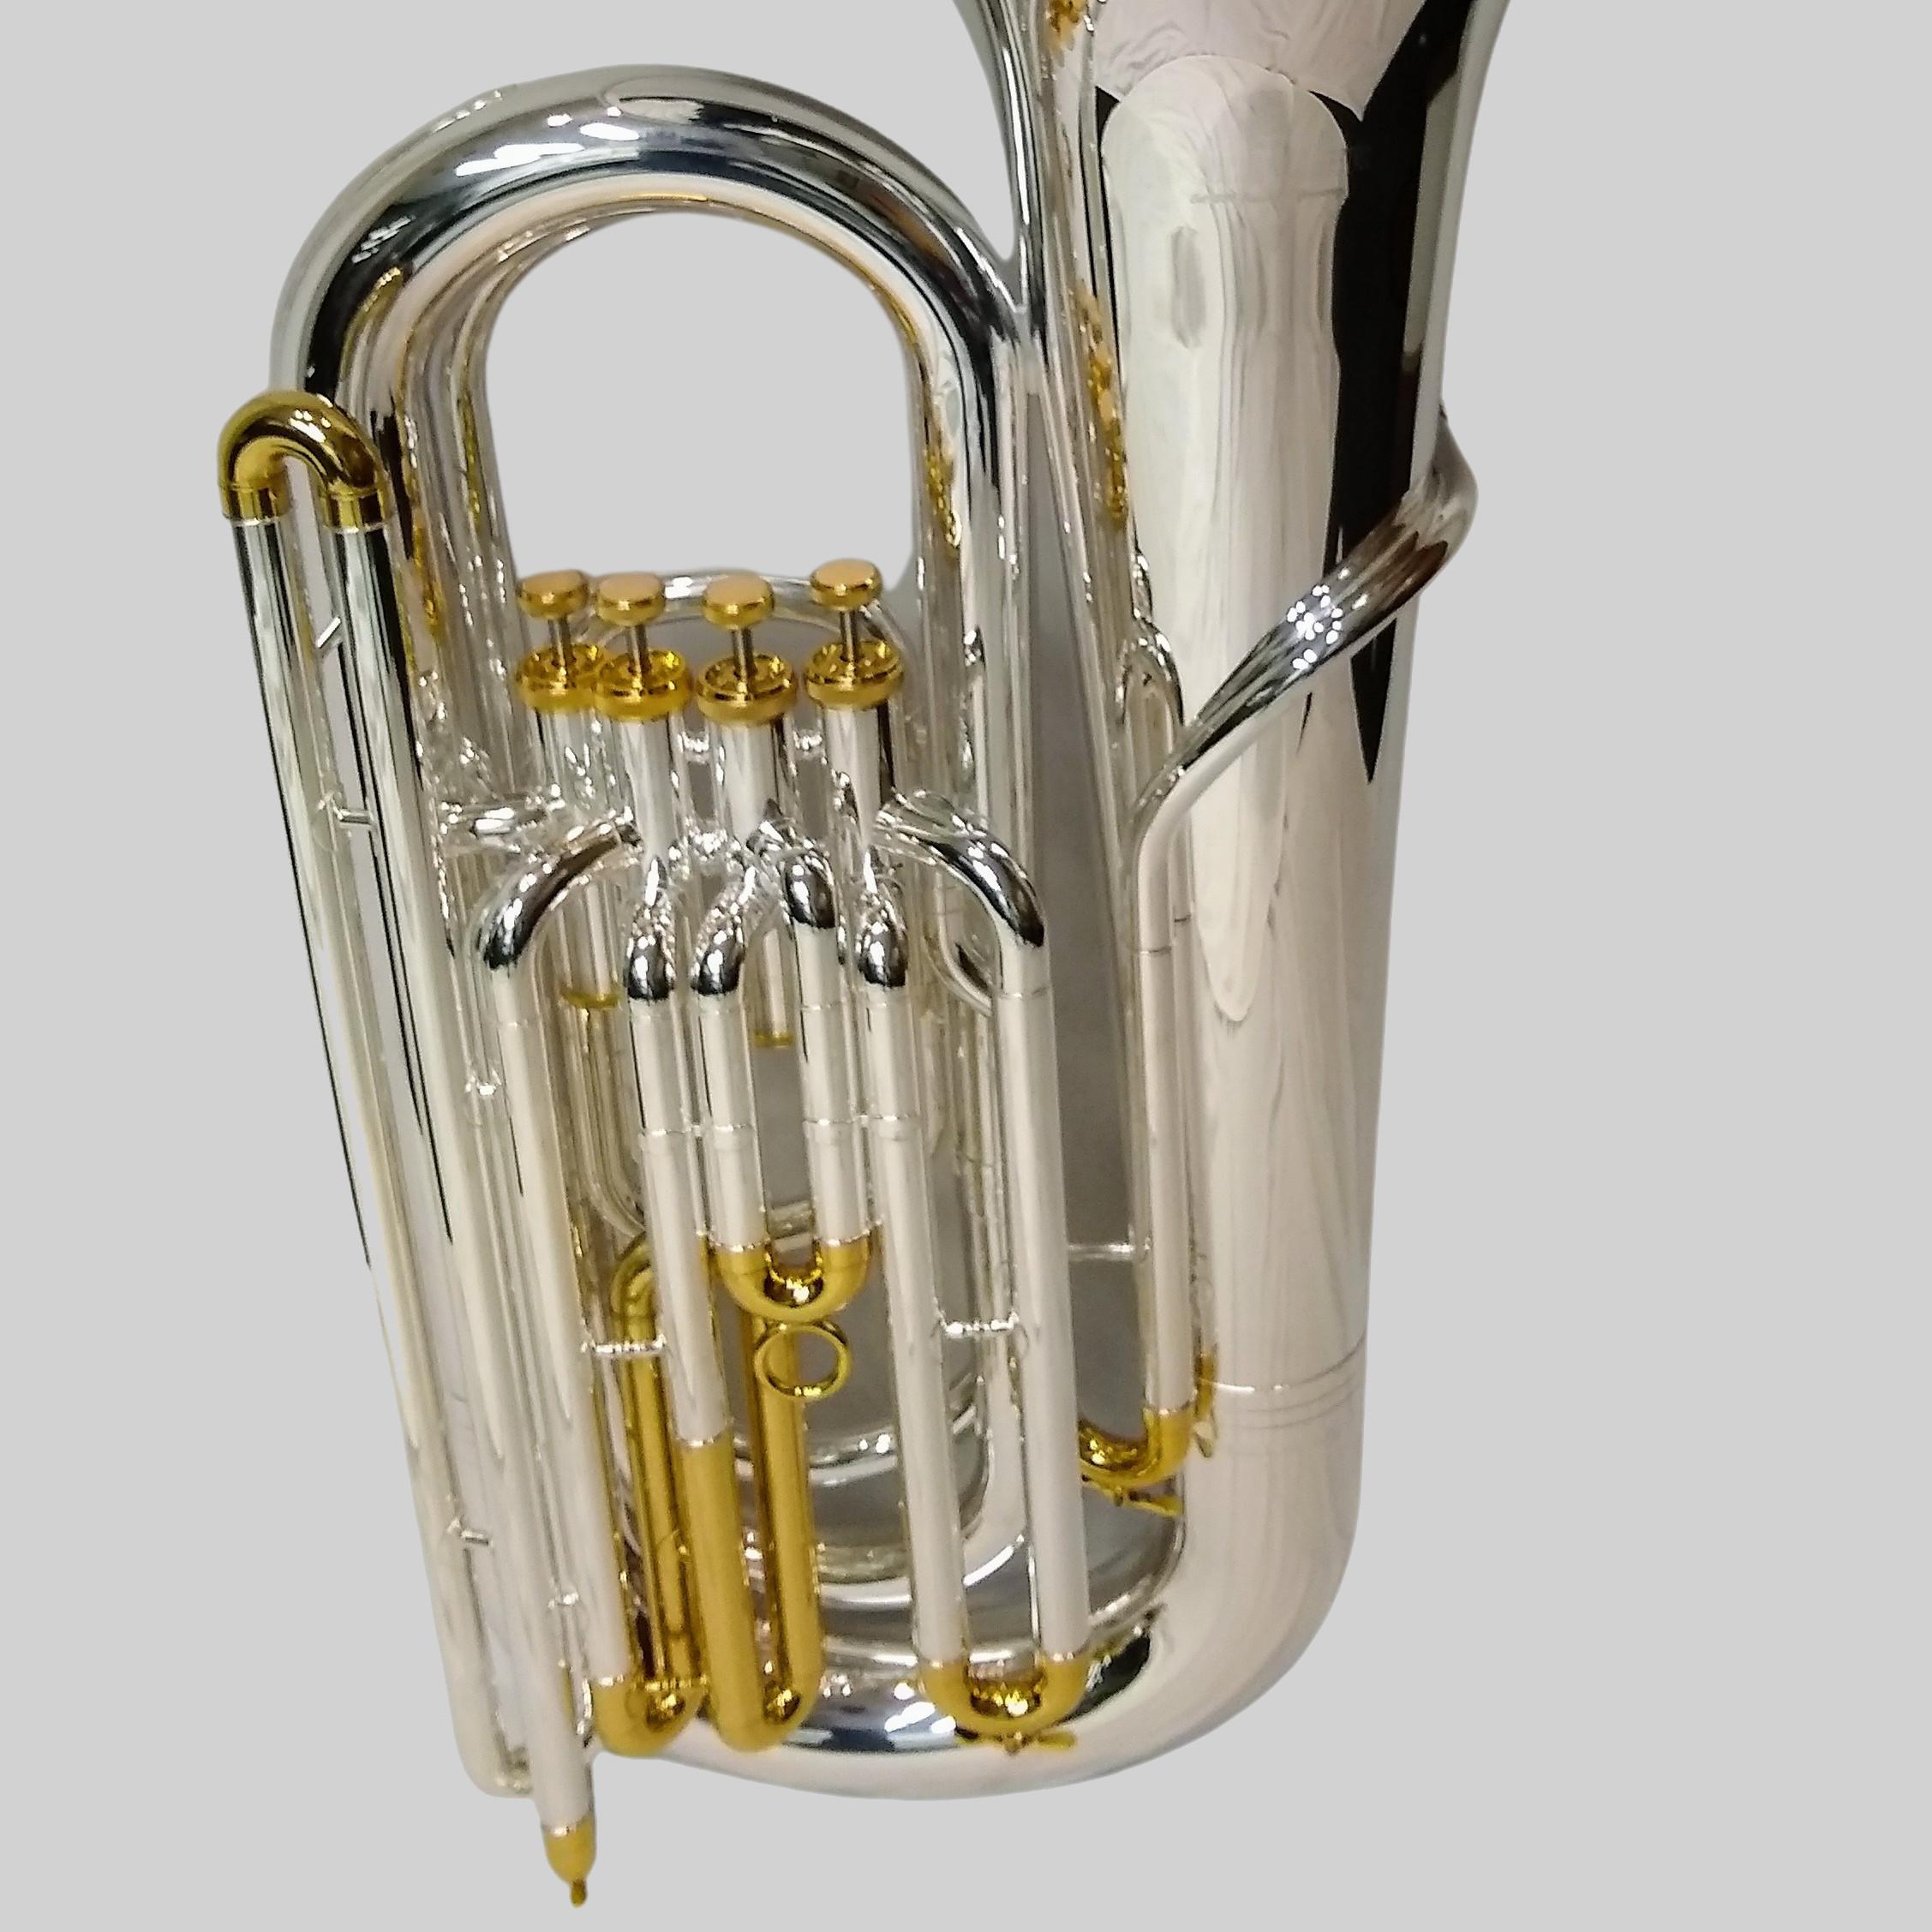 American Heritage 4 Valve Piston Inline BBb Tuba – Silver/Gold